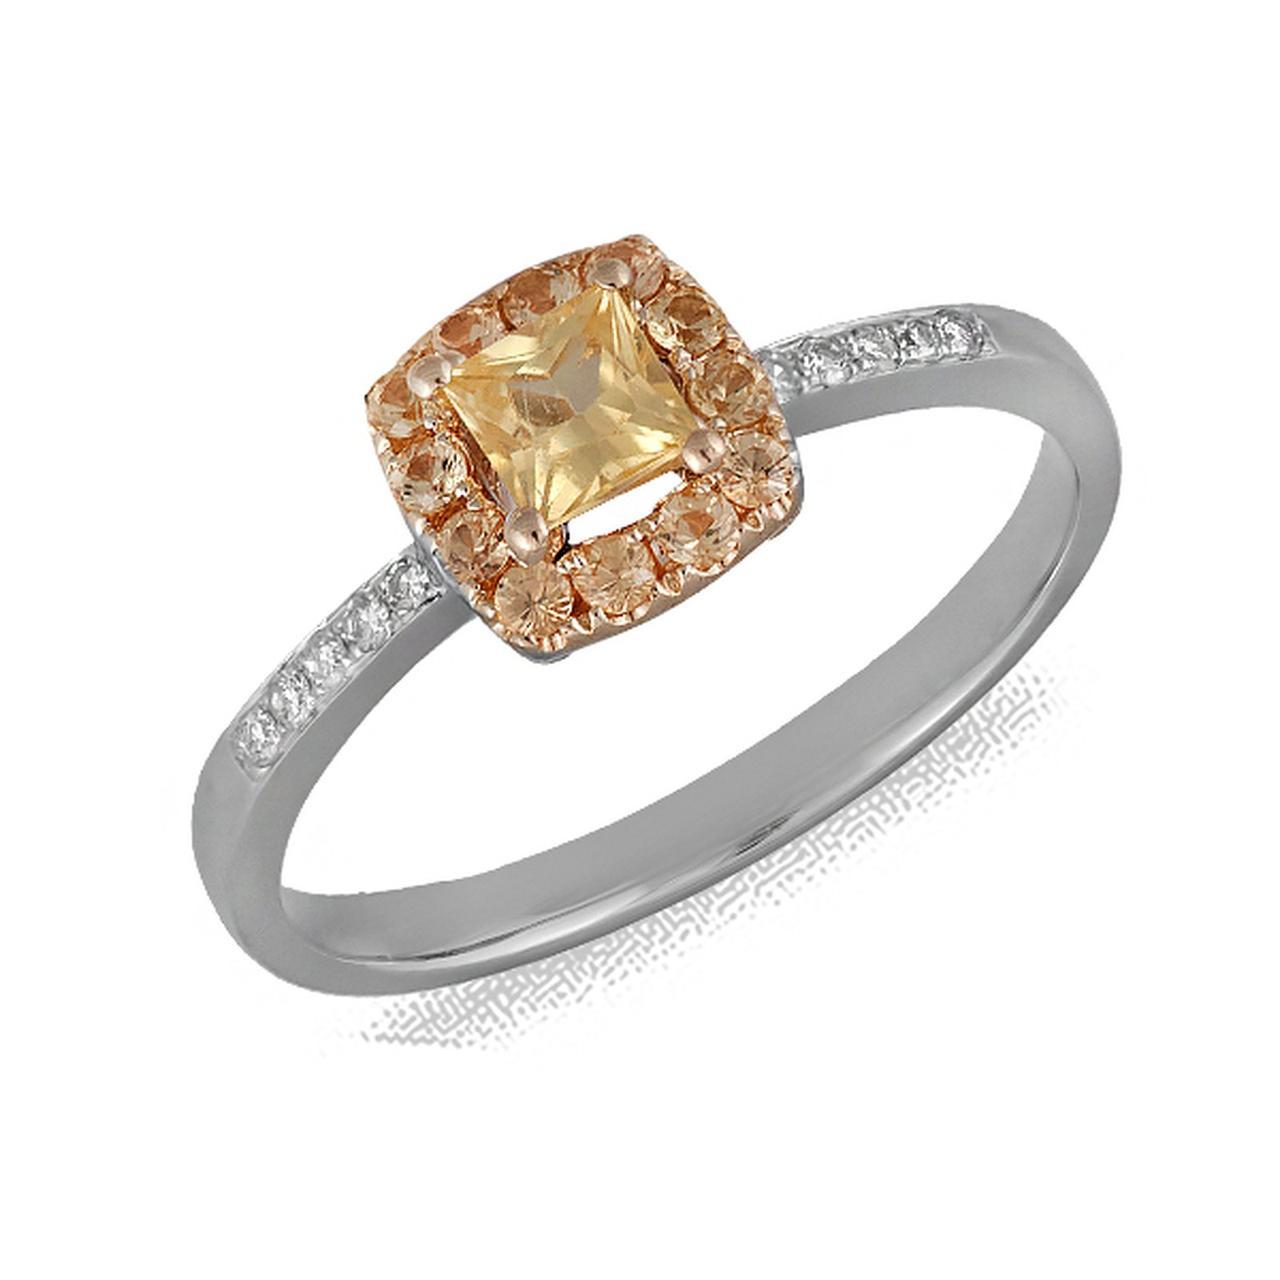 Золотое кольцо с бриллиантами и сапфирами, размер 18 (075742)